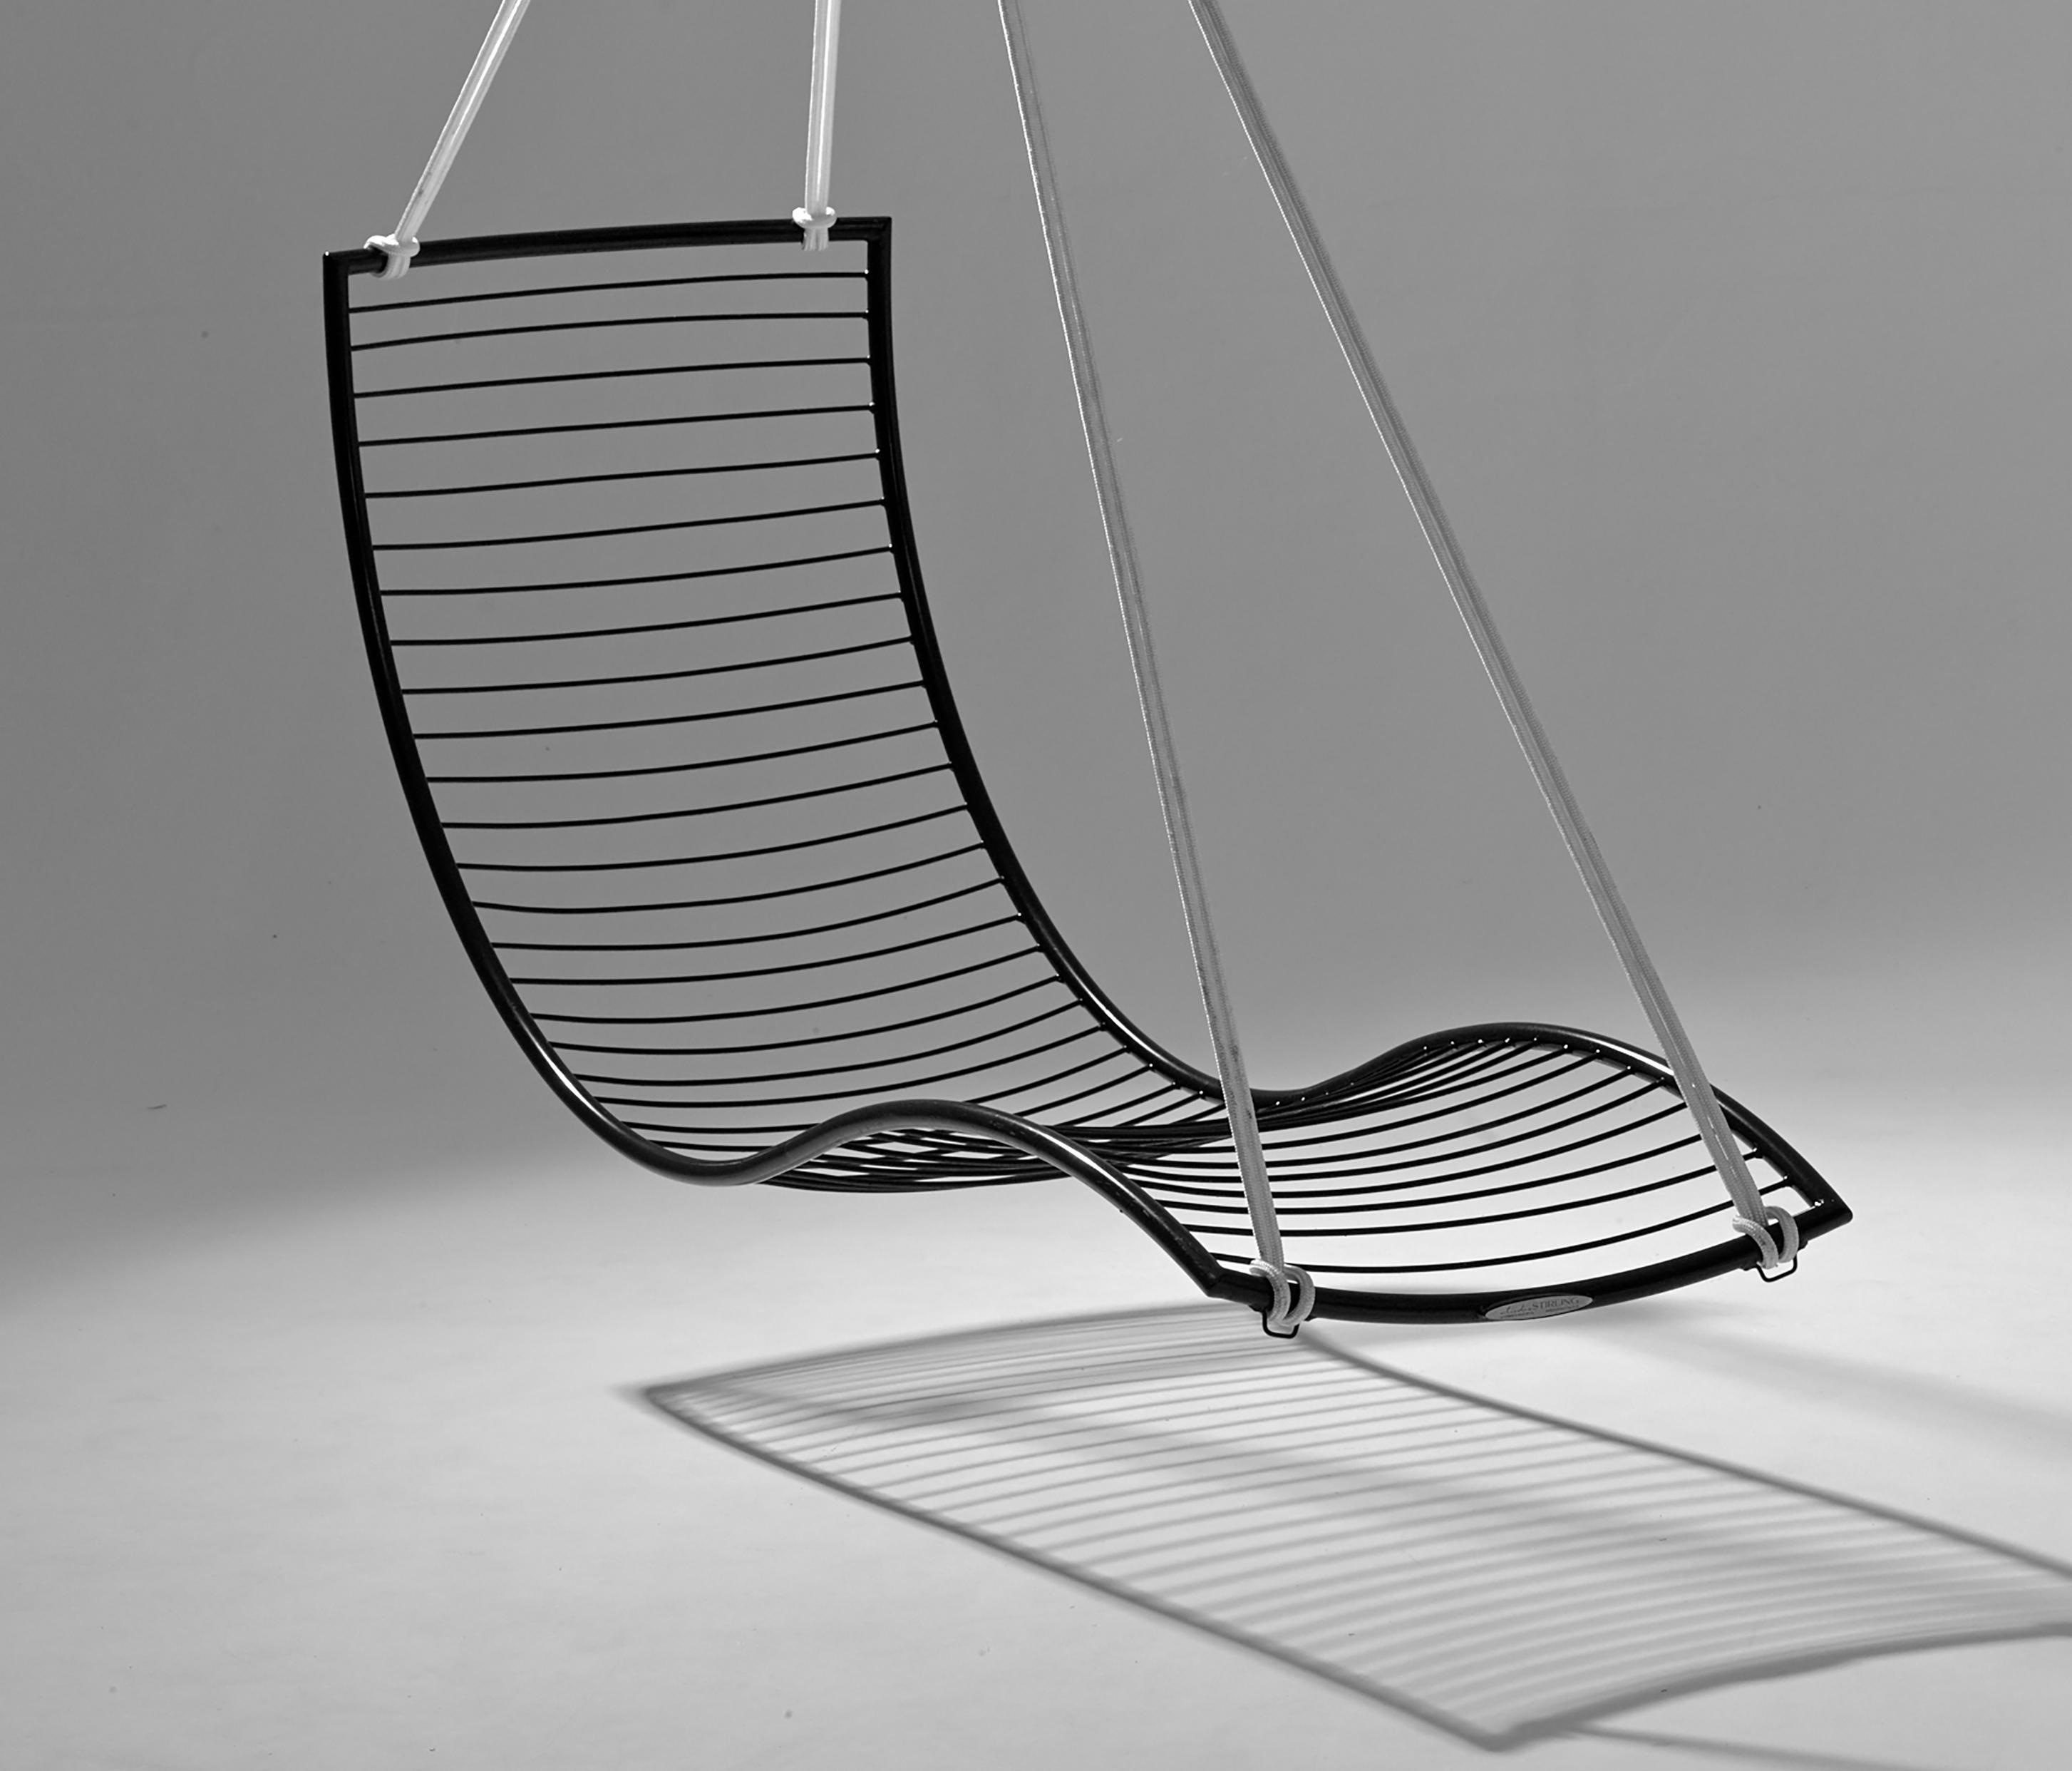 swing chair johannesburg wedding cover hire newcastle upon tyne curve hanging sedie da giardino studio